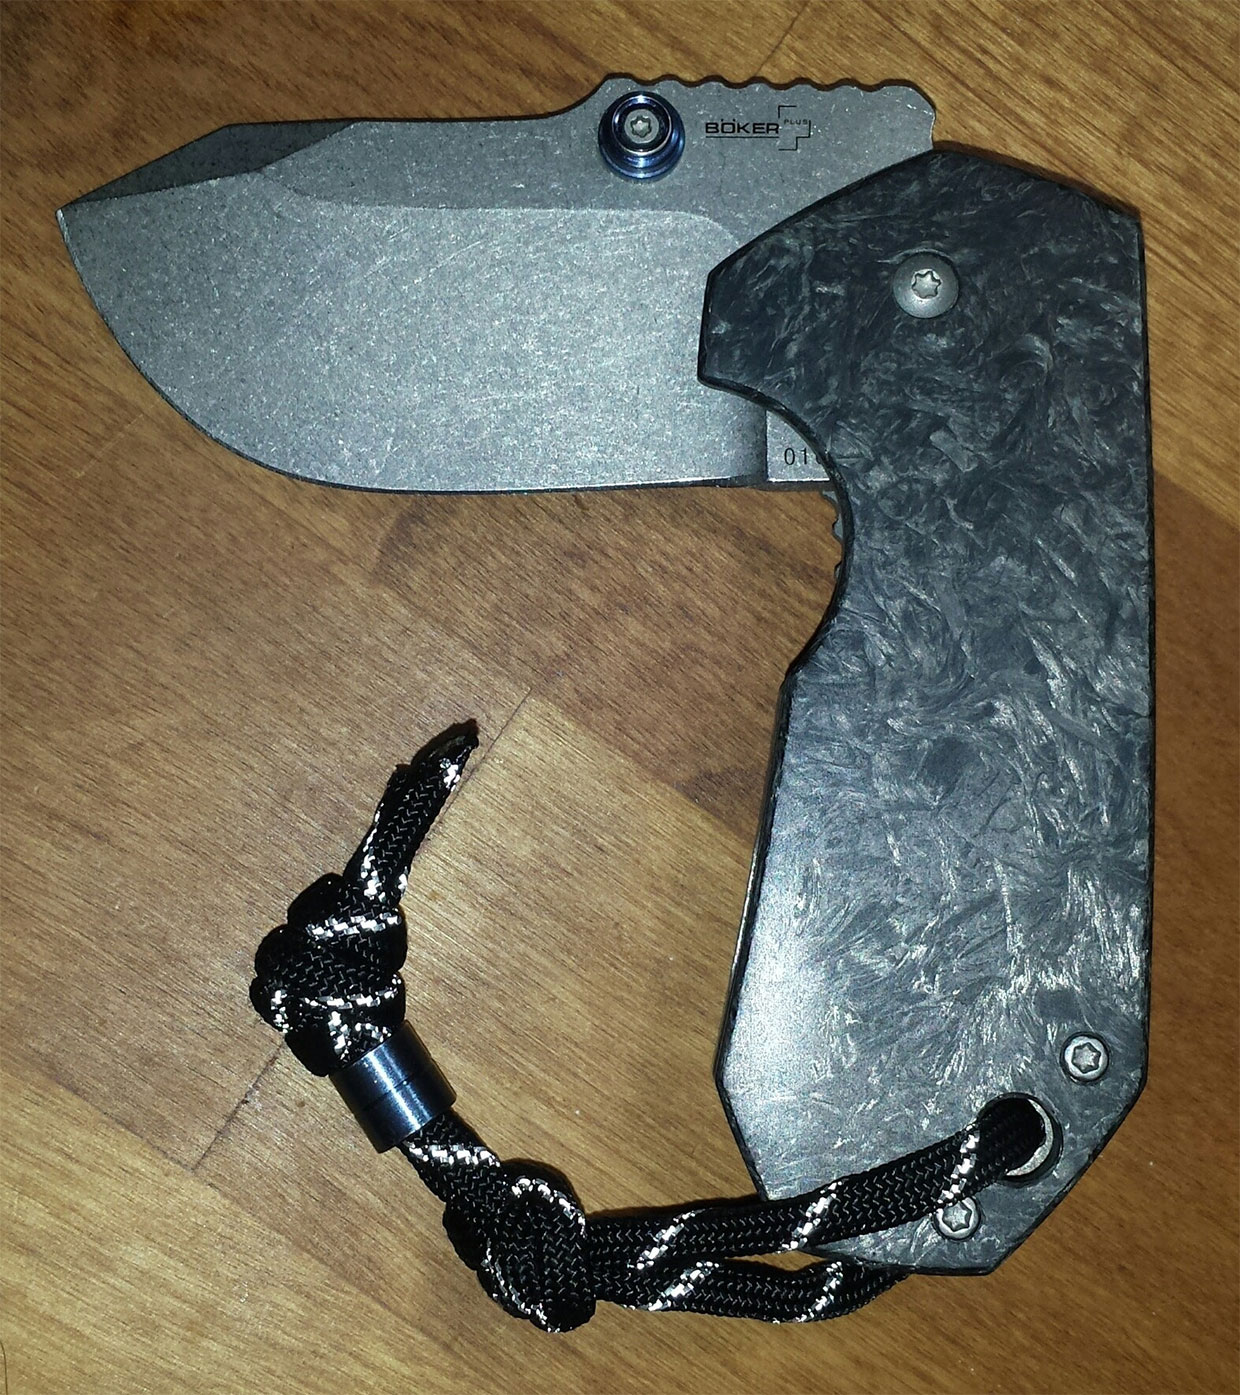 Carbon Fiber Anso Albatross Knife